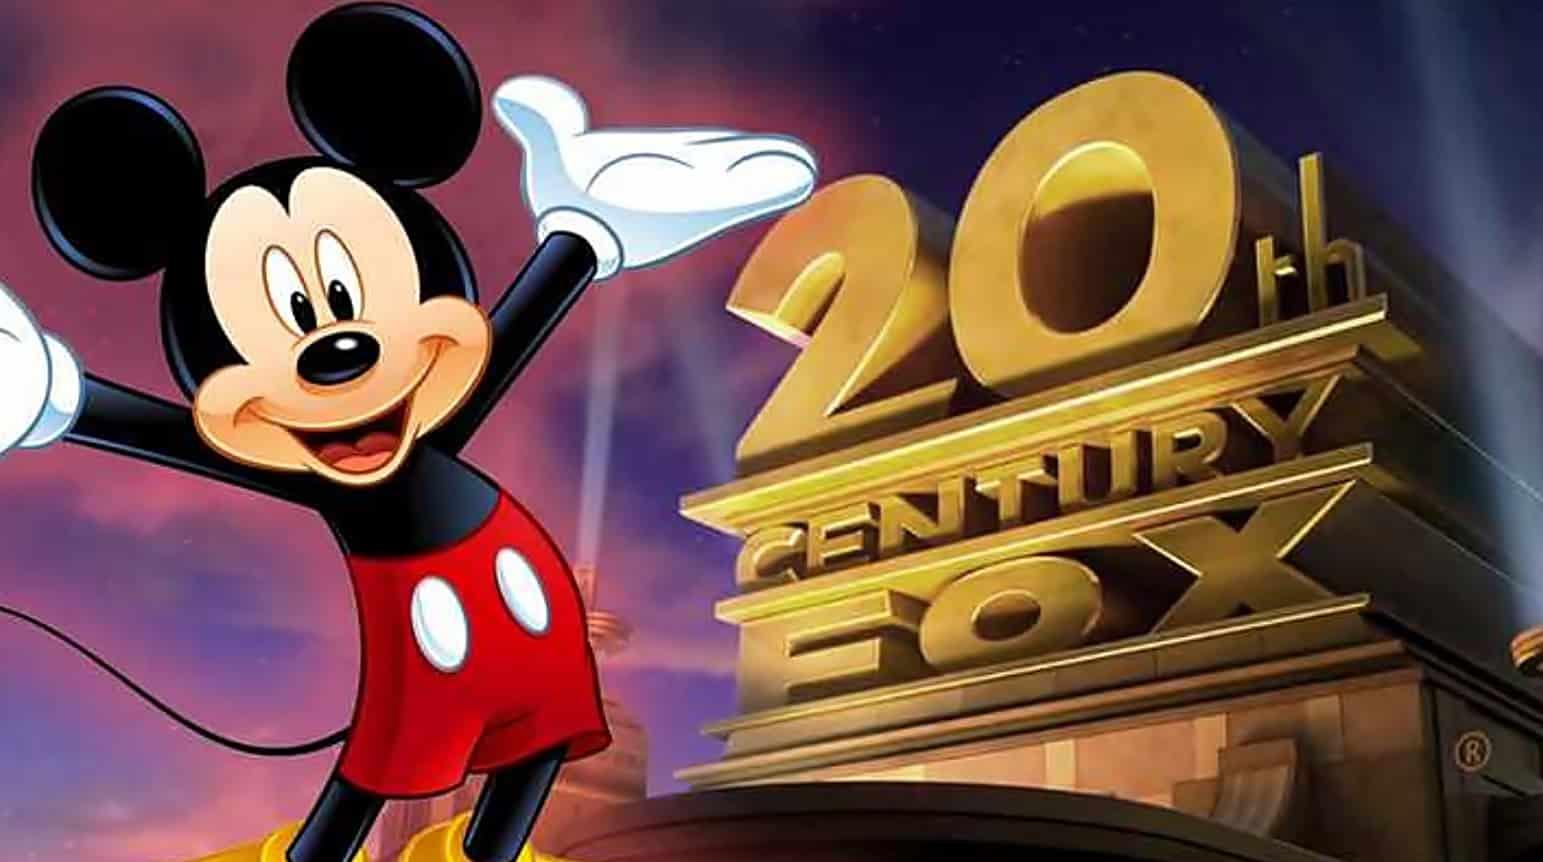 Disney Fox Merger